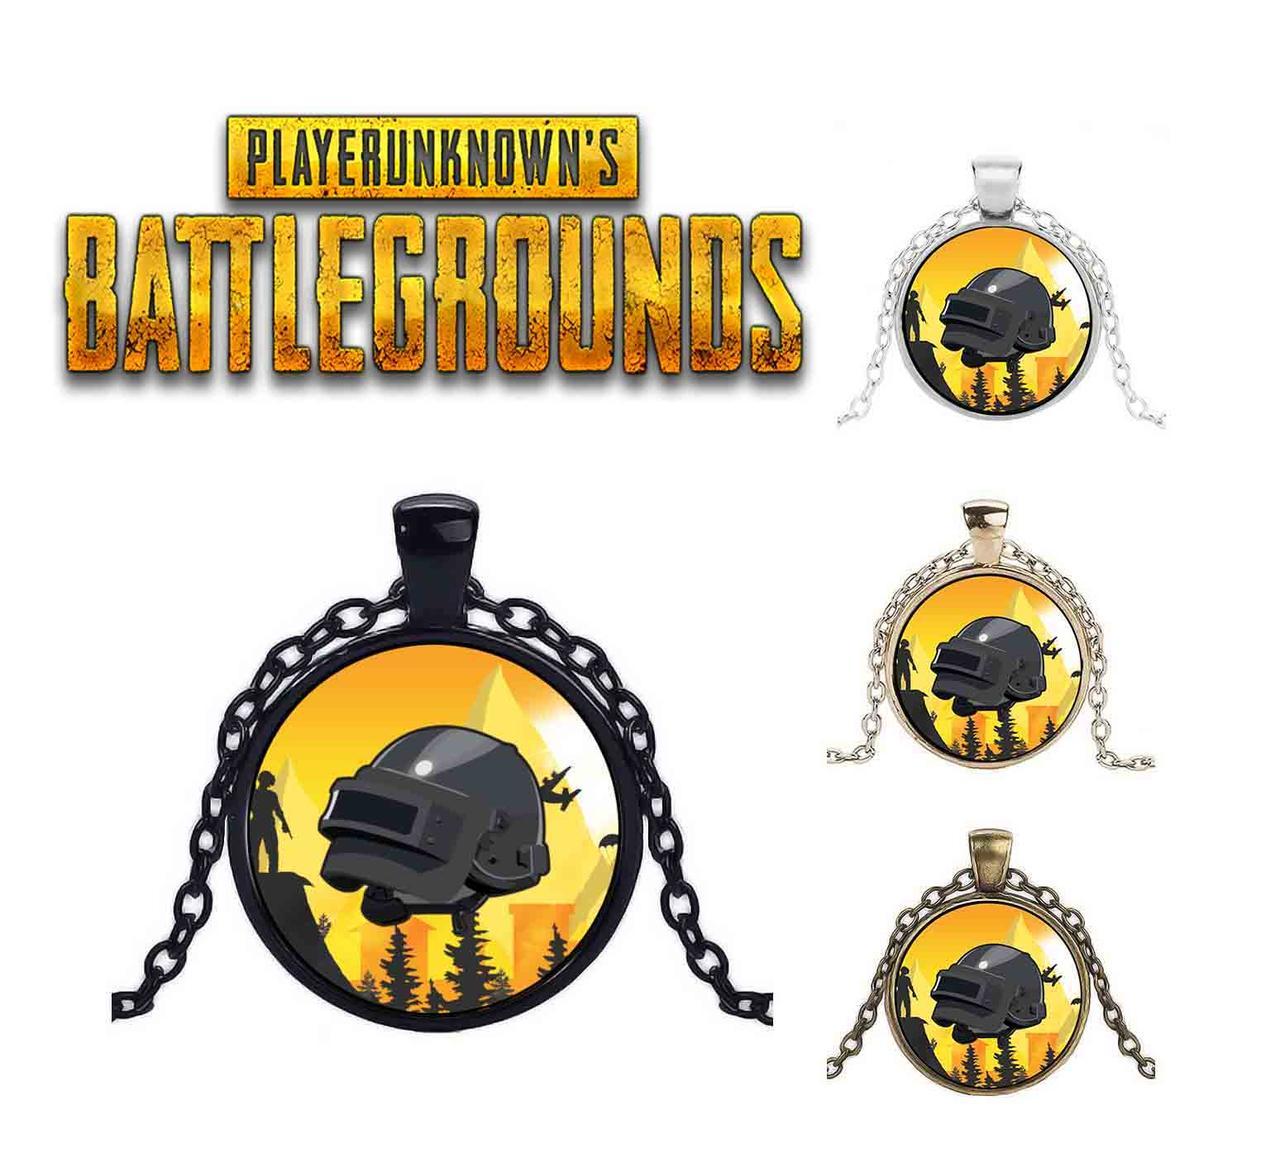 Кулон на желтом фоне PlayerUnknown's Battlegrounds  PUBG